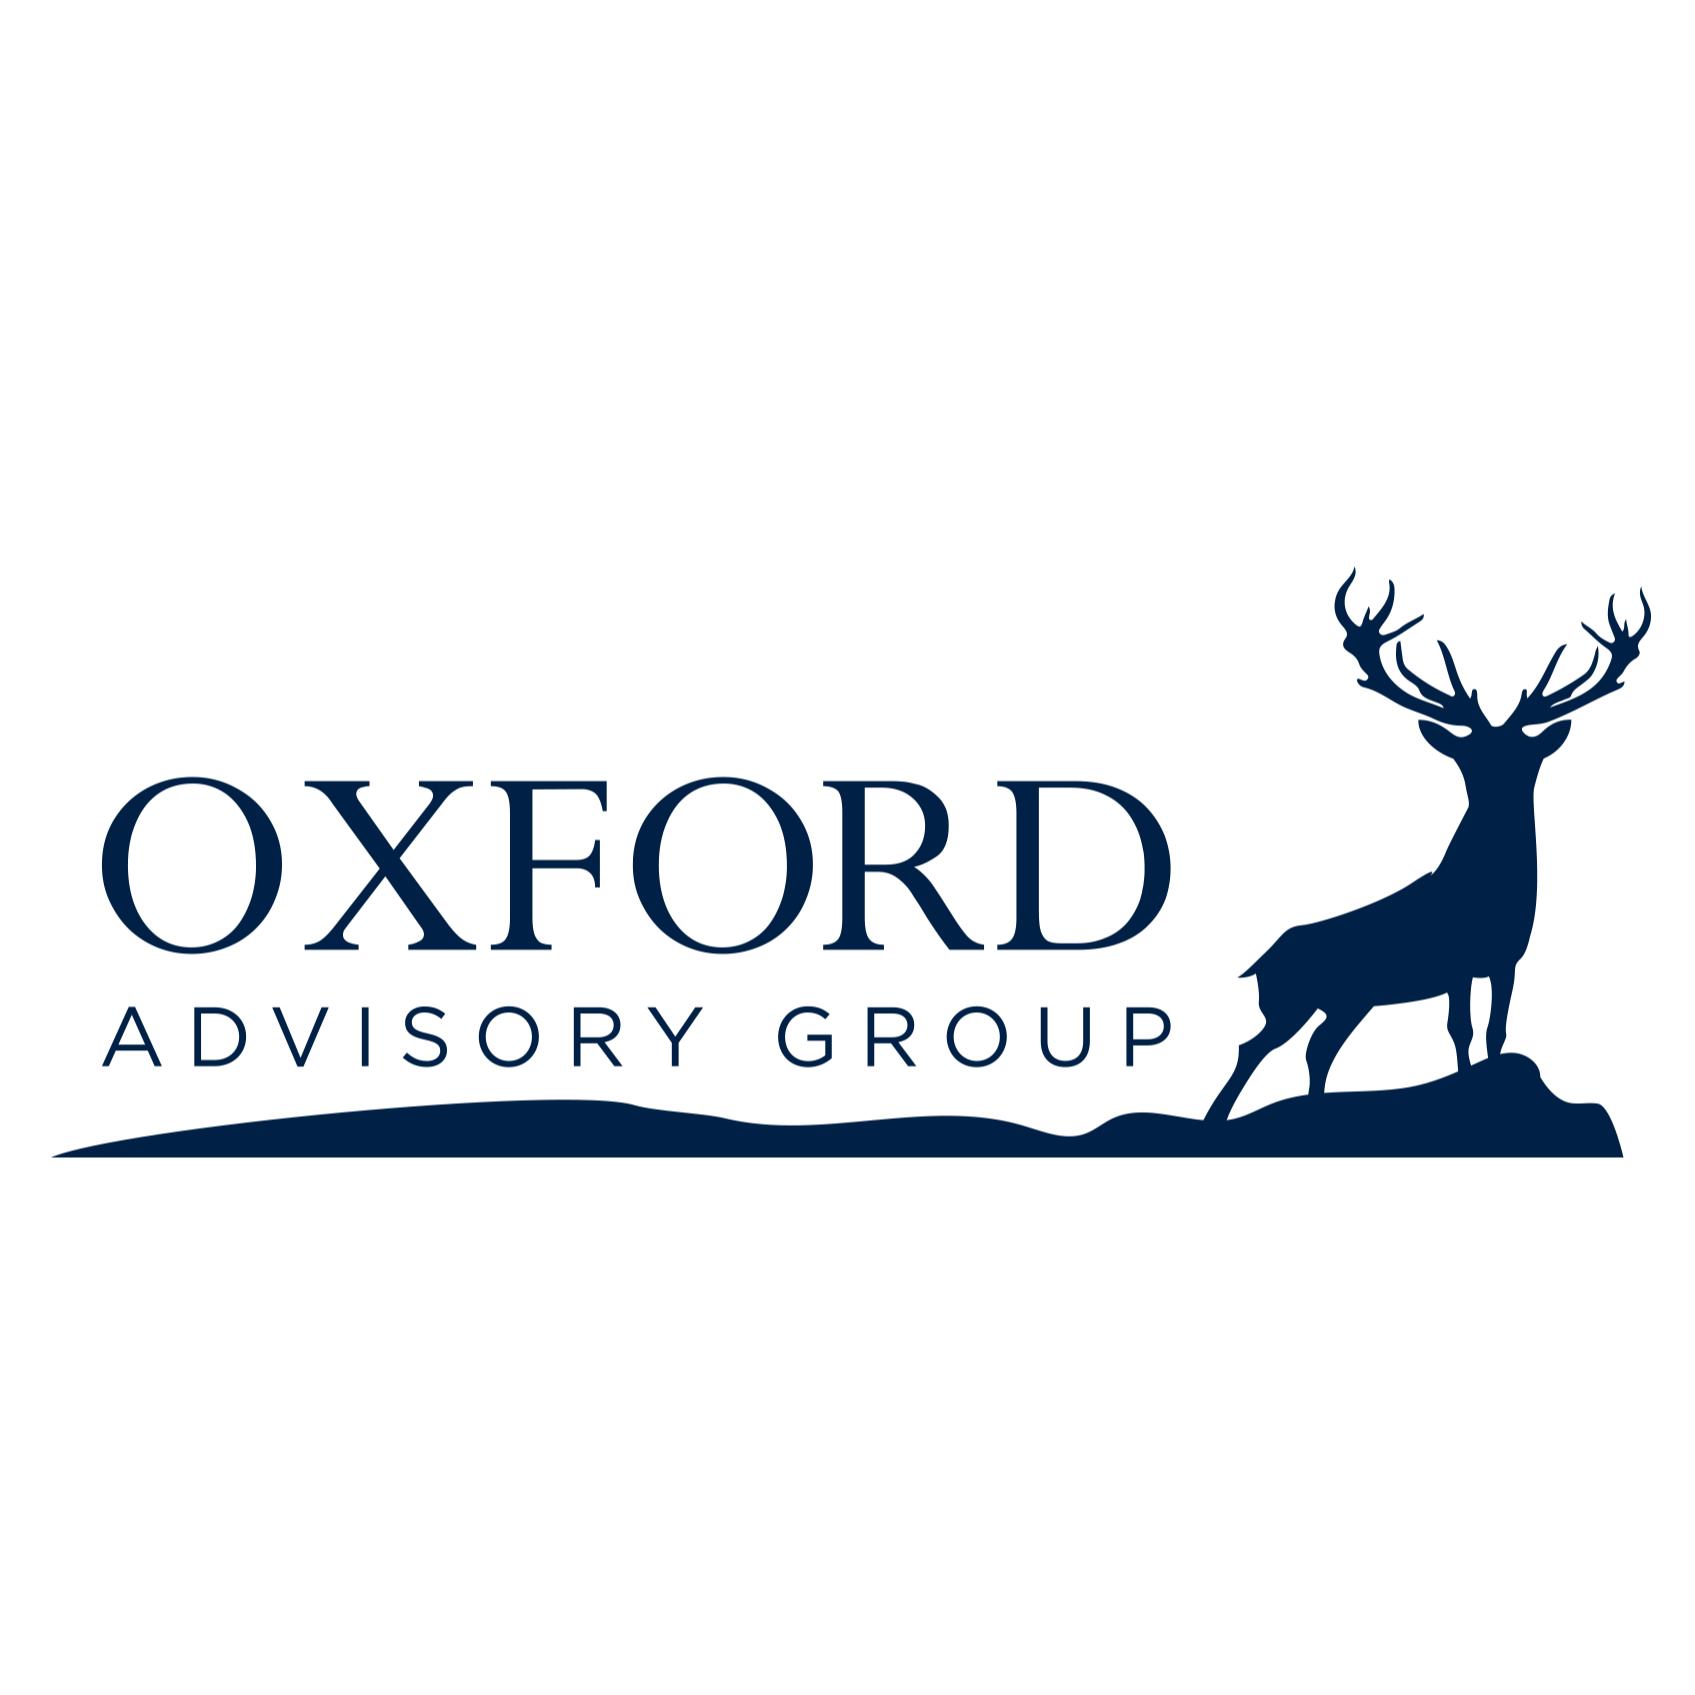 Oxford Advisory Group